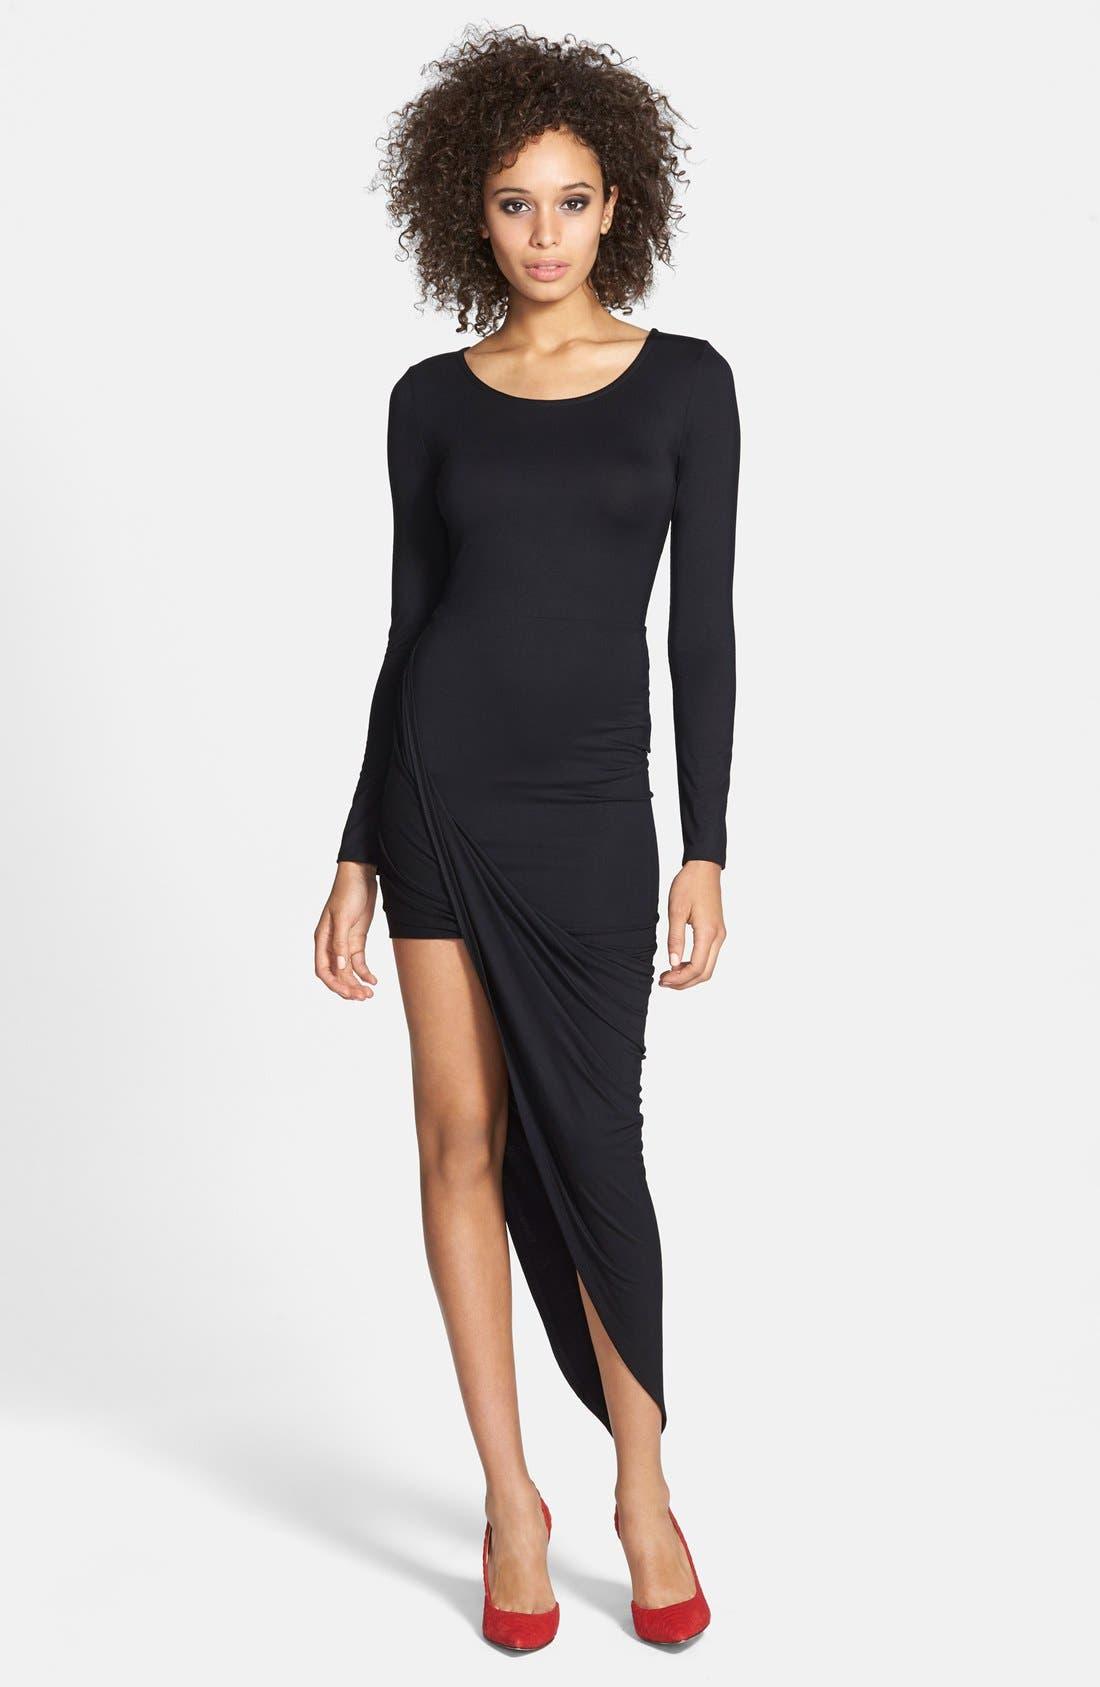 Main Image - ASTR Twist Wrap Asymmetrical Body-Con Dress